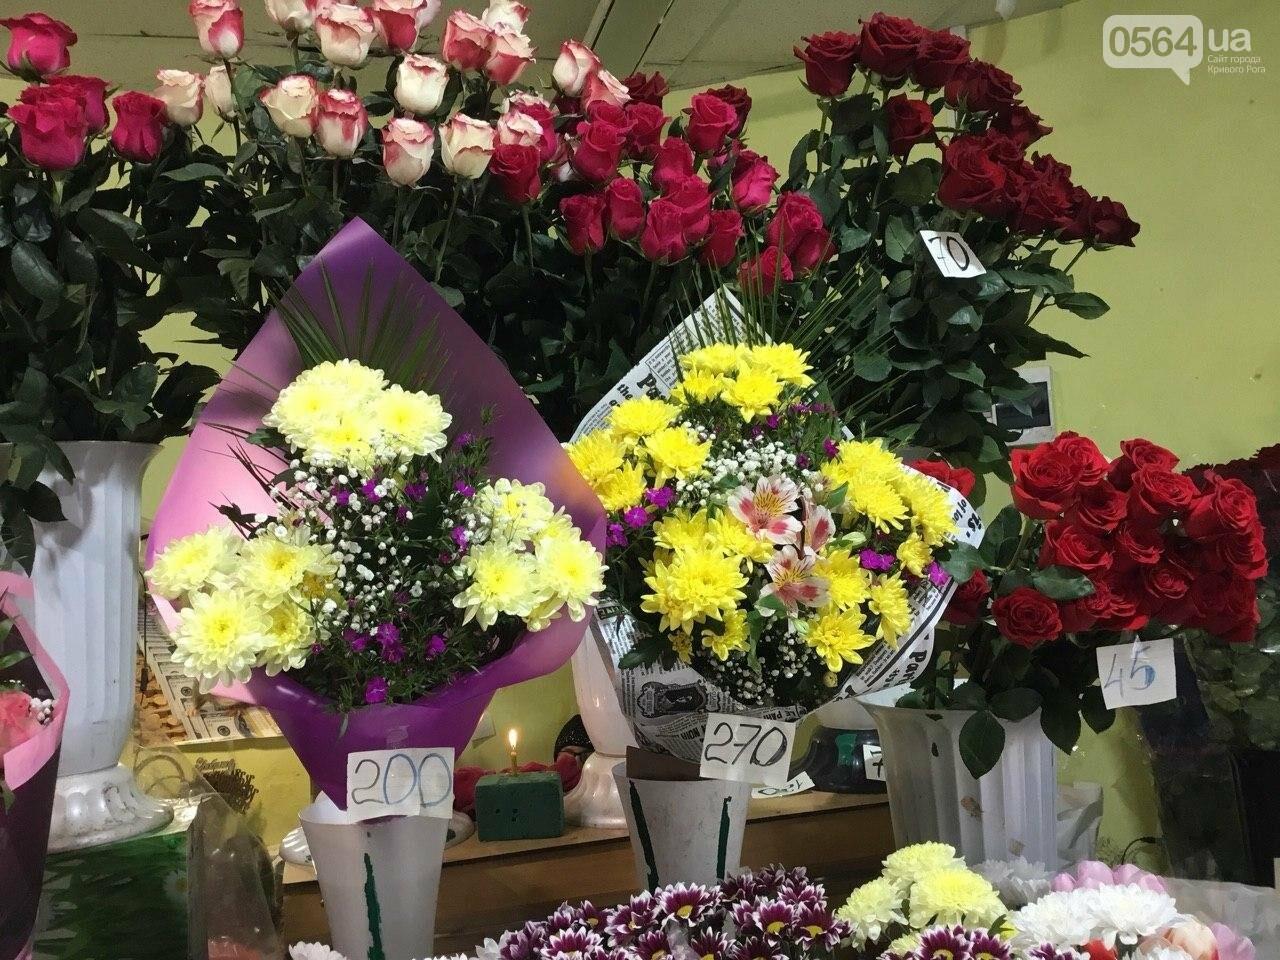 Сколько стоят примула, цикламен, мимоза? Обзор цен на цветы в Кривом Роге, - ФОТО, ВИДЕО, фото-7